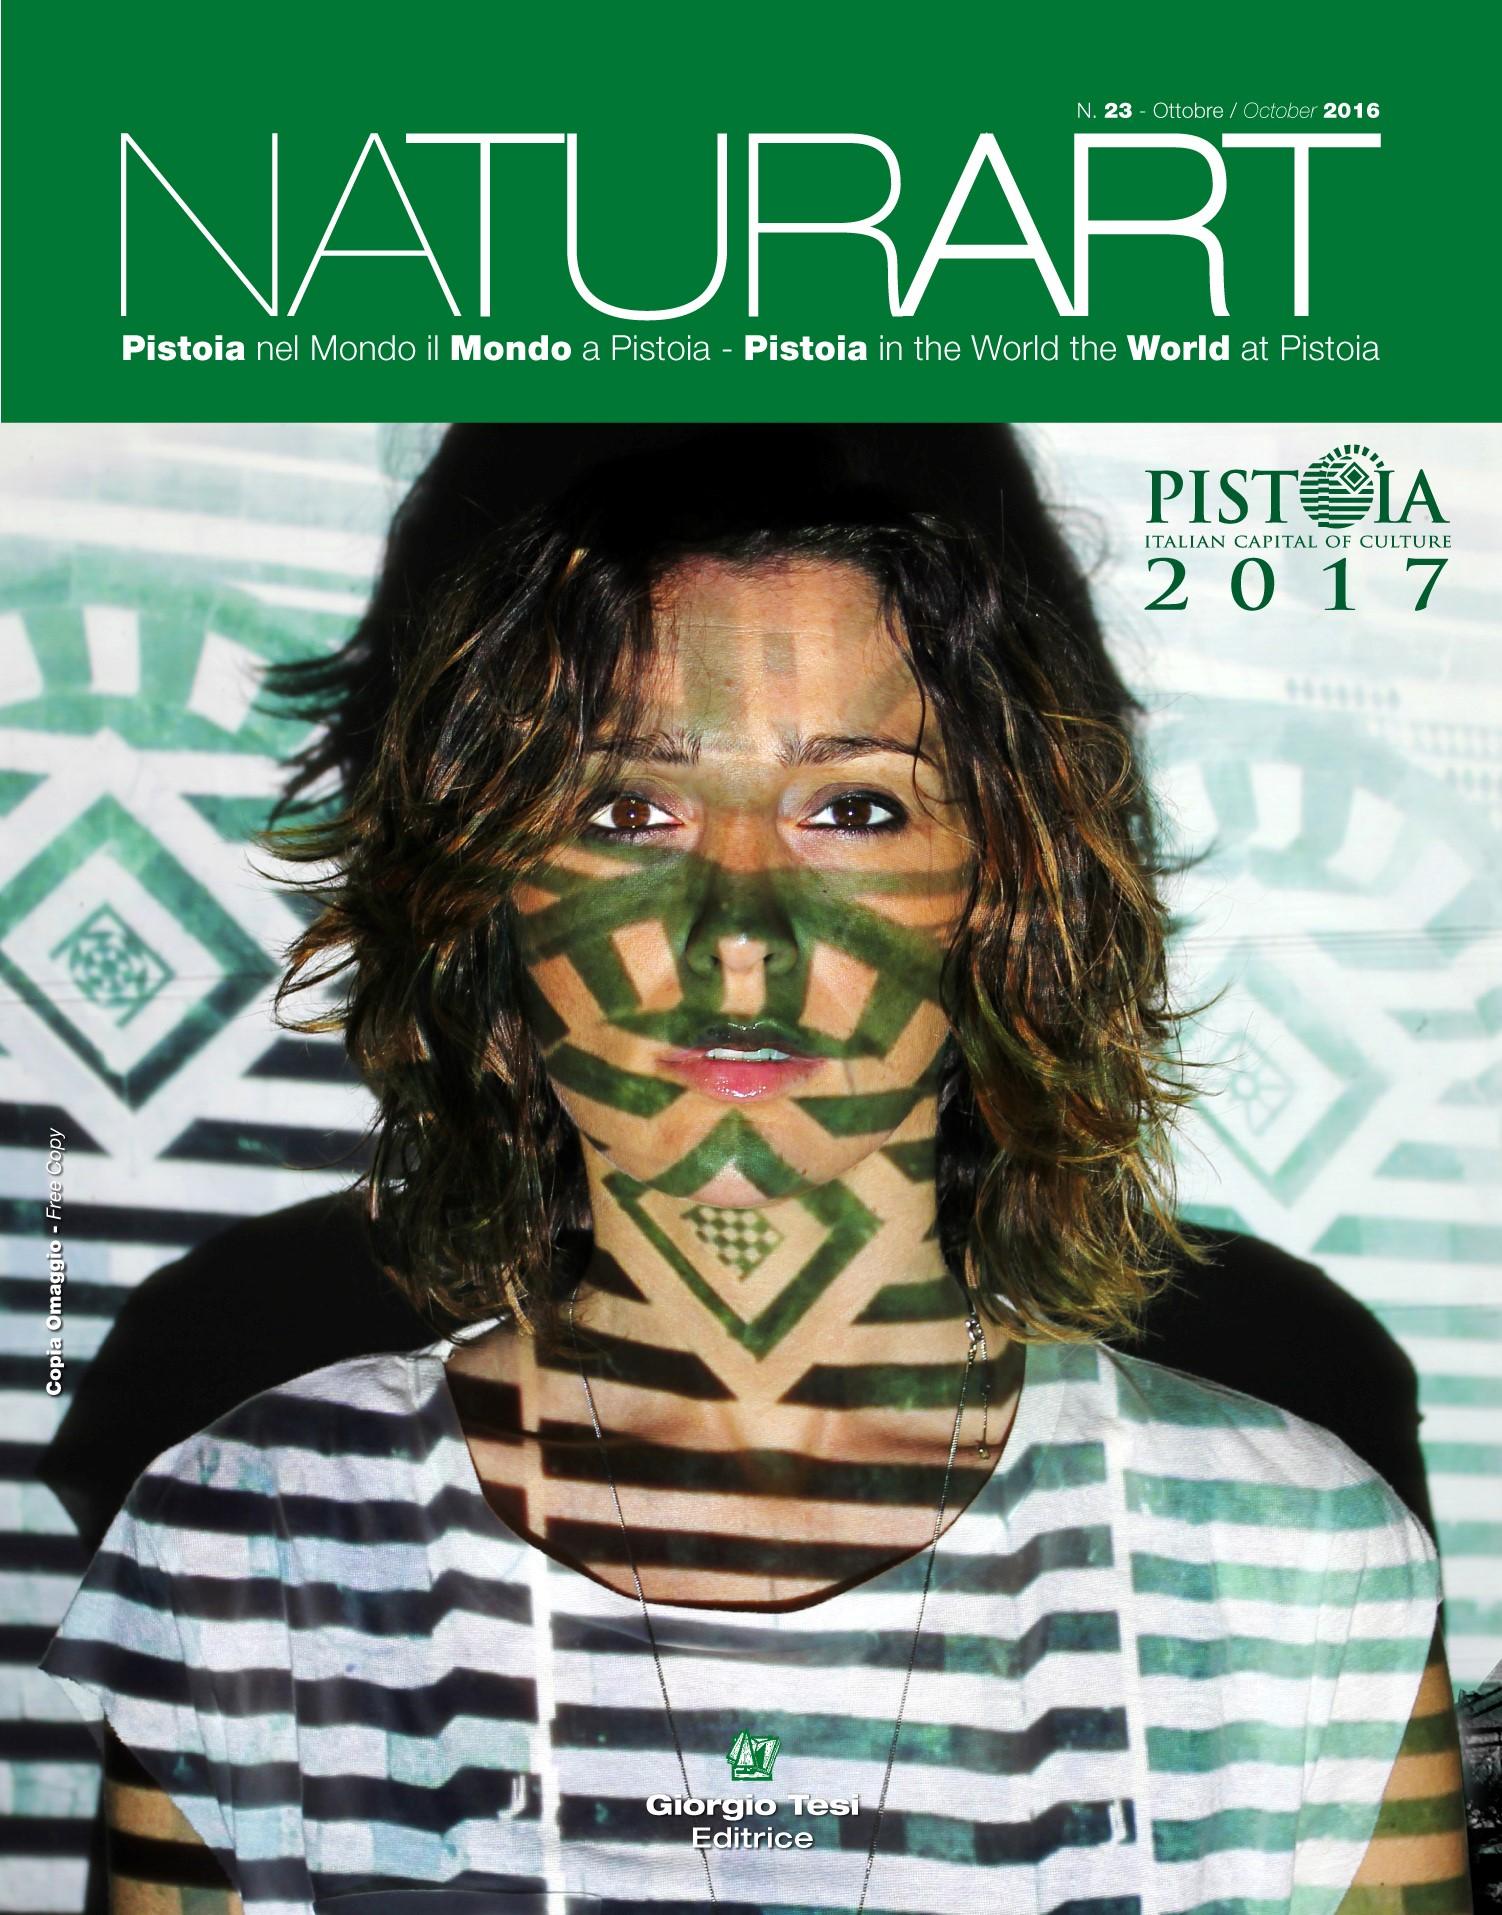 naturart copertina